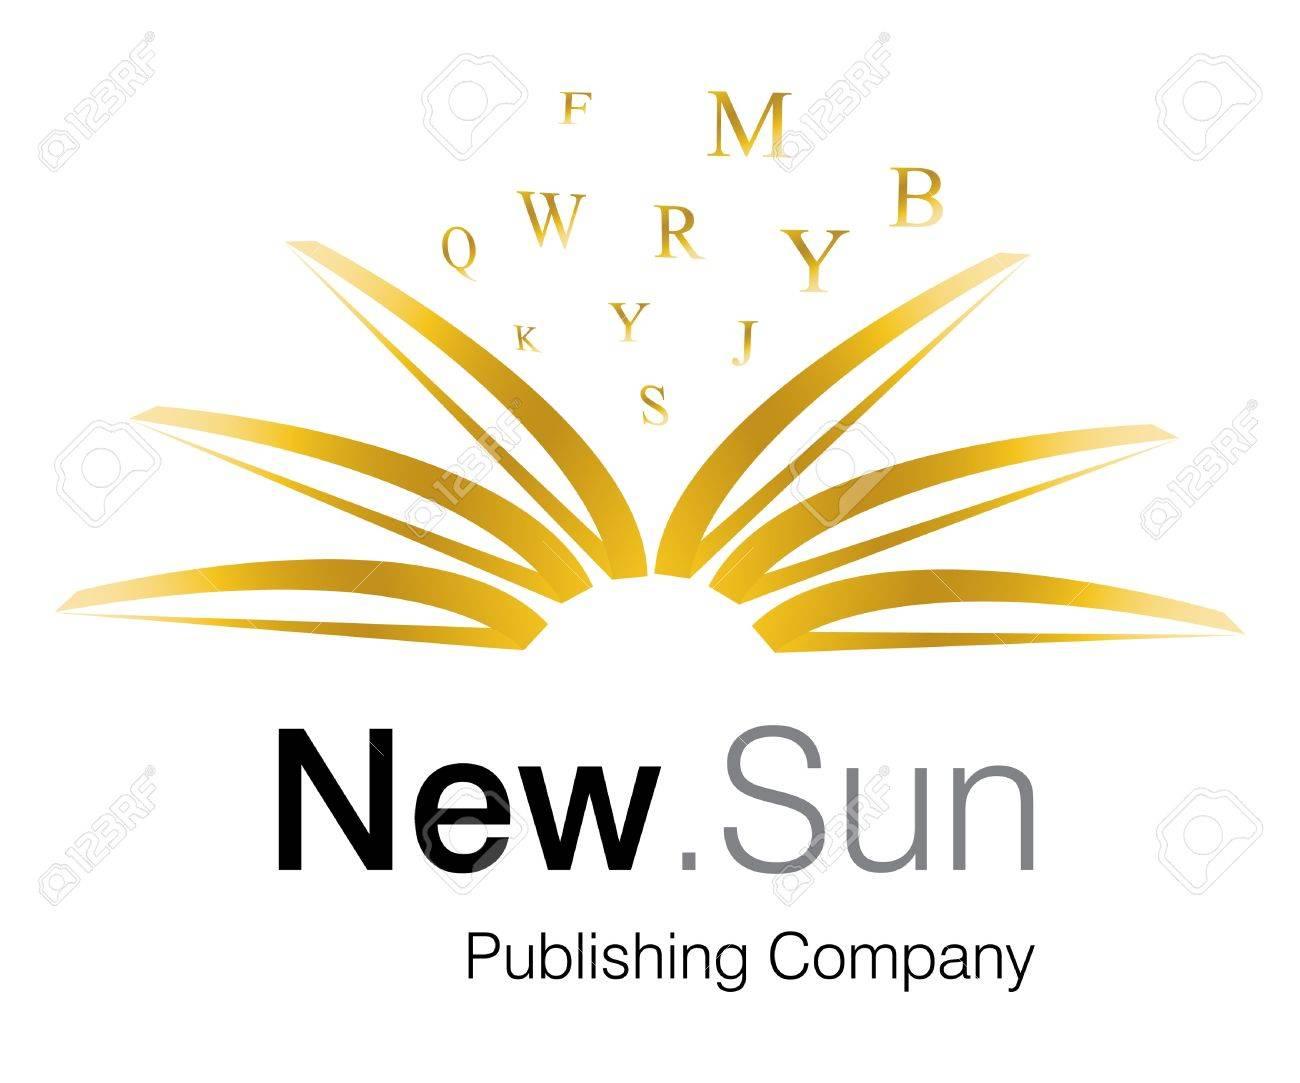 Logo Design for Publishing company. Stock Photo - 8307137